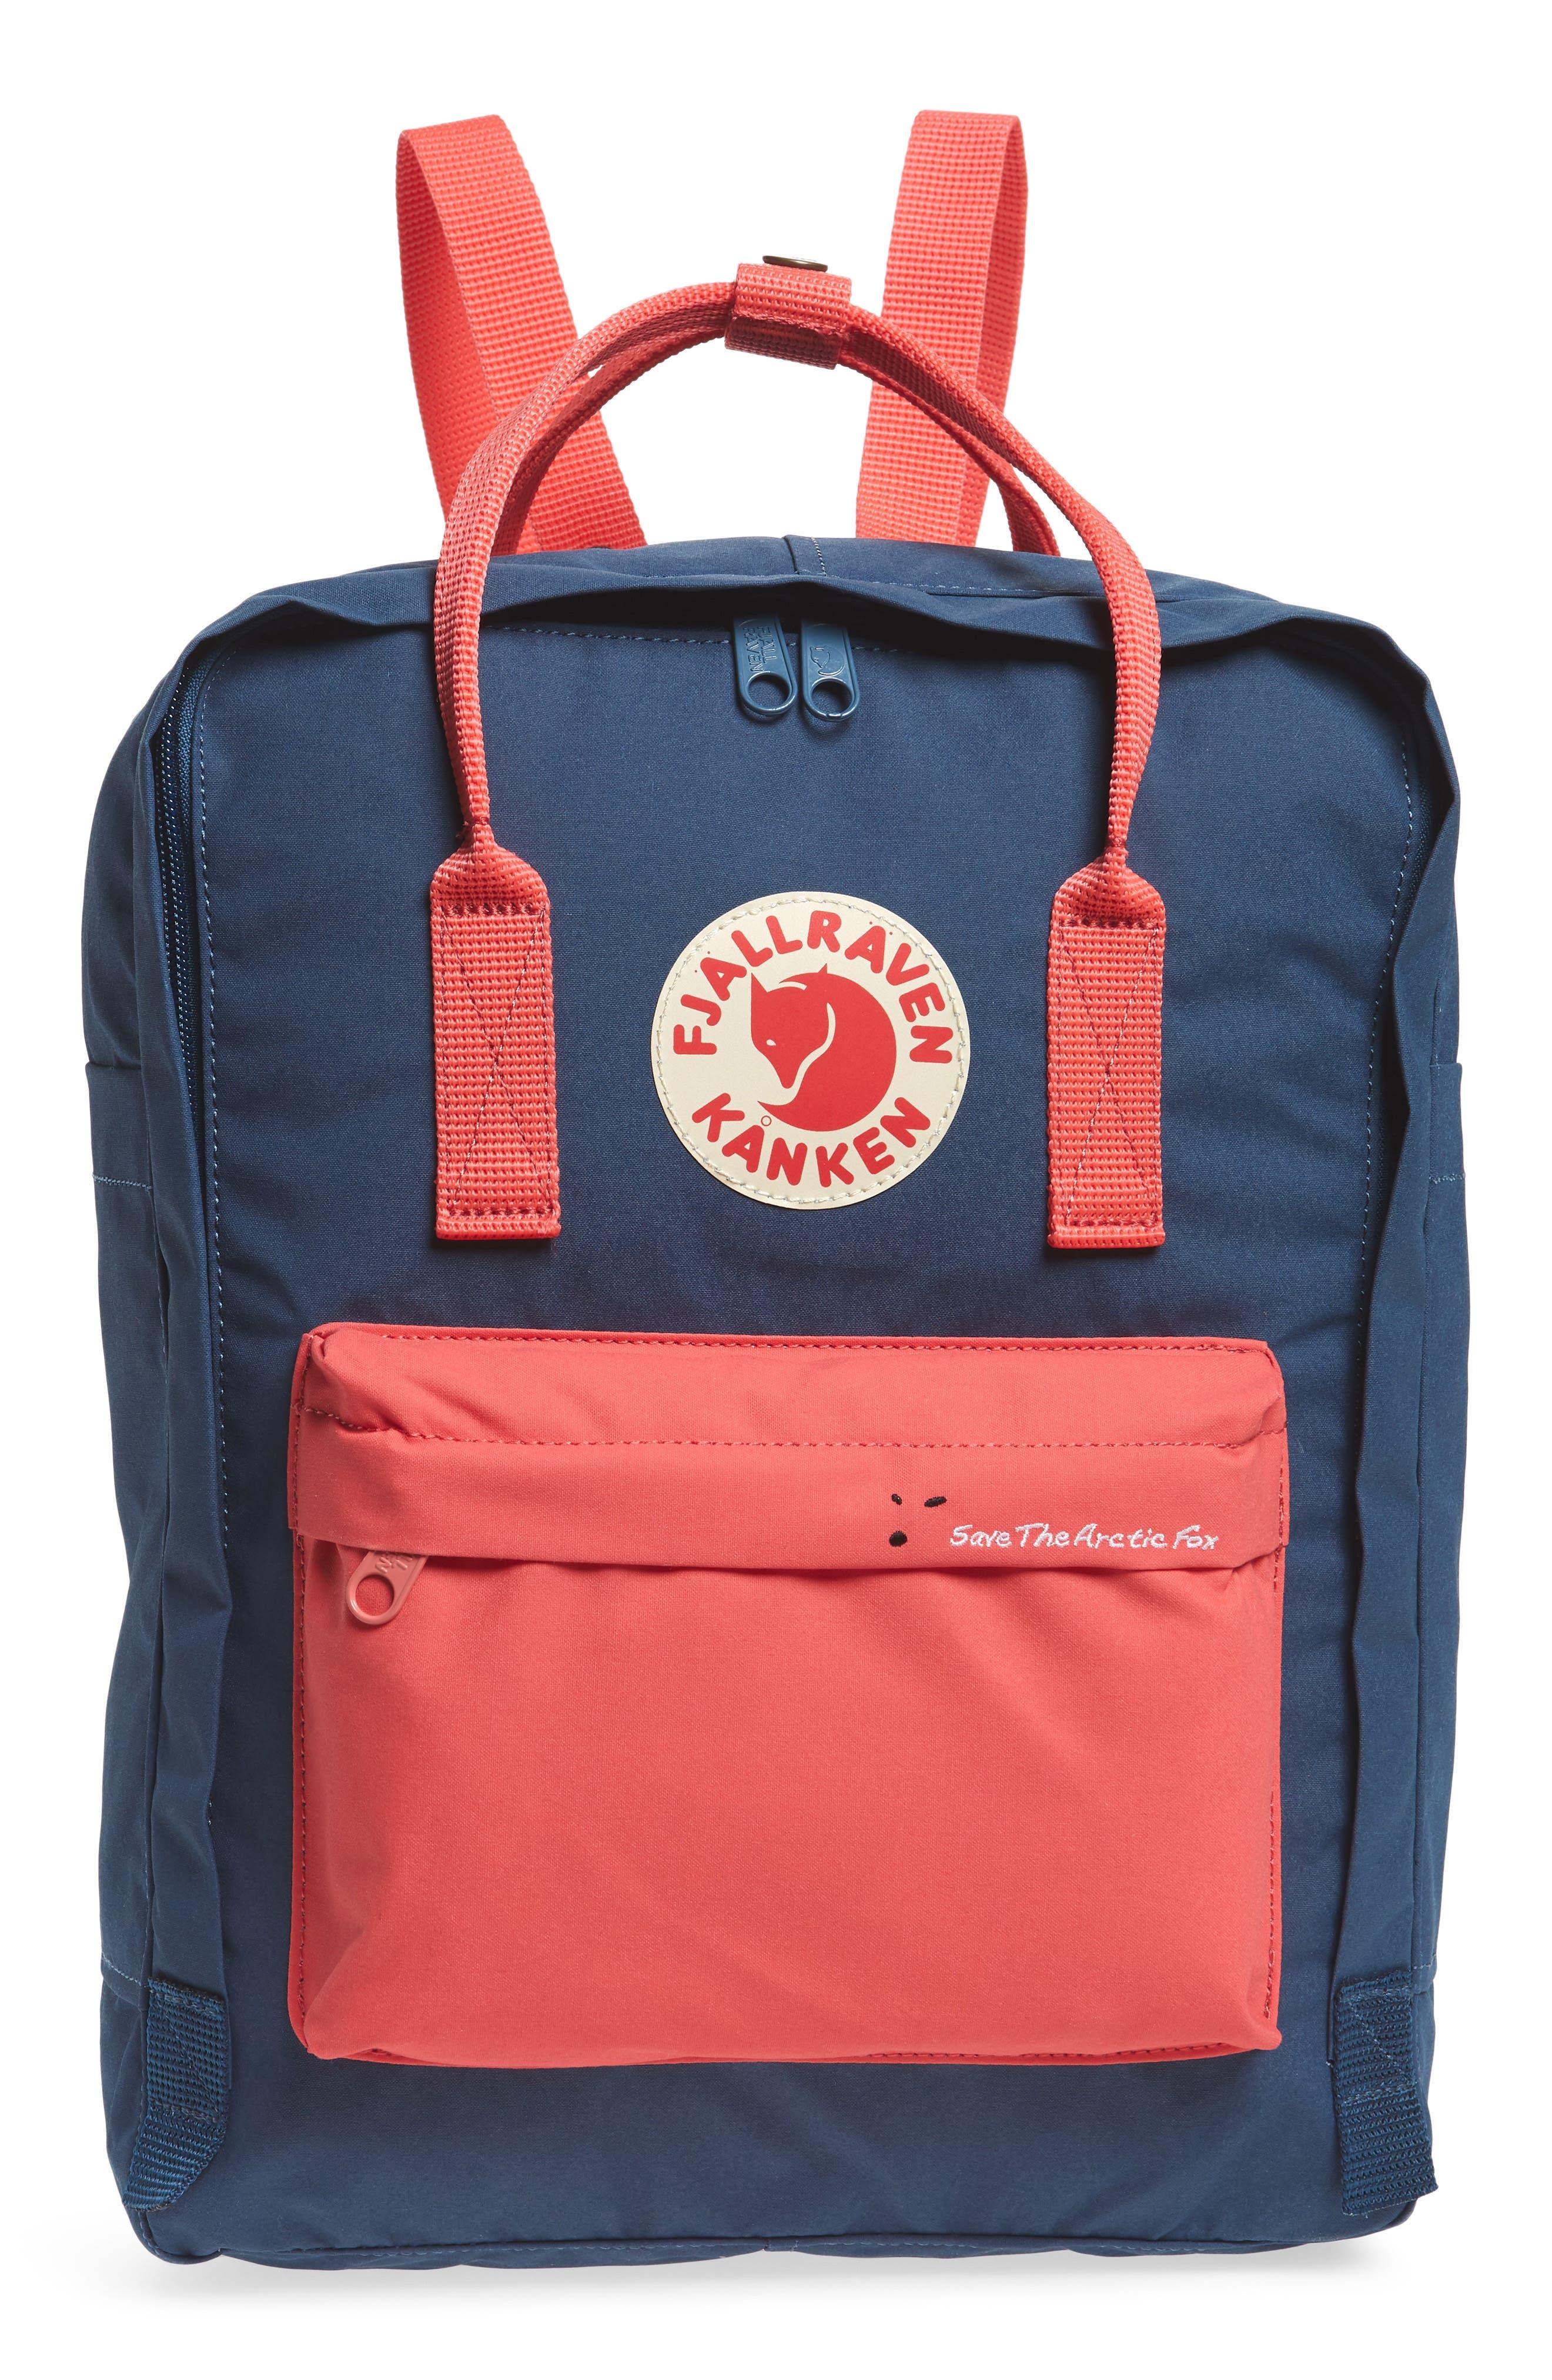 Arctic Fox Kånken Backpack,                             Main thumbnail 1, color,                             ROYAL BLUE/ PEACH PINK